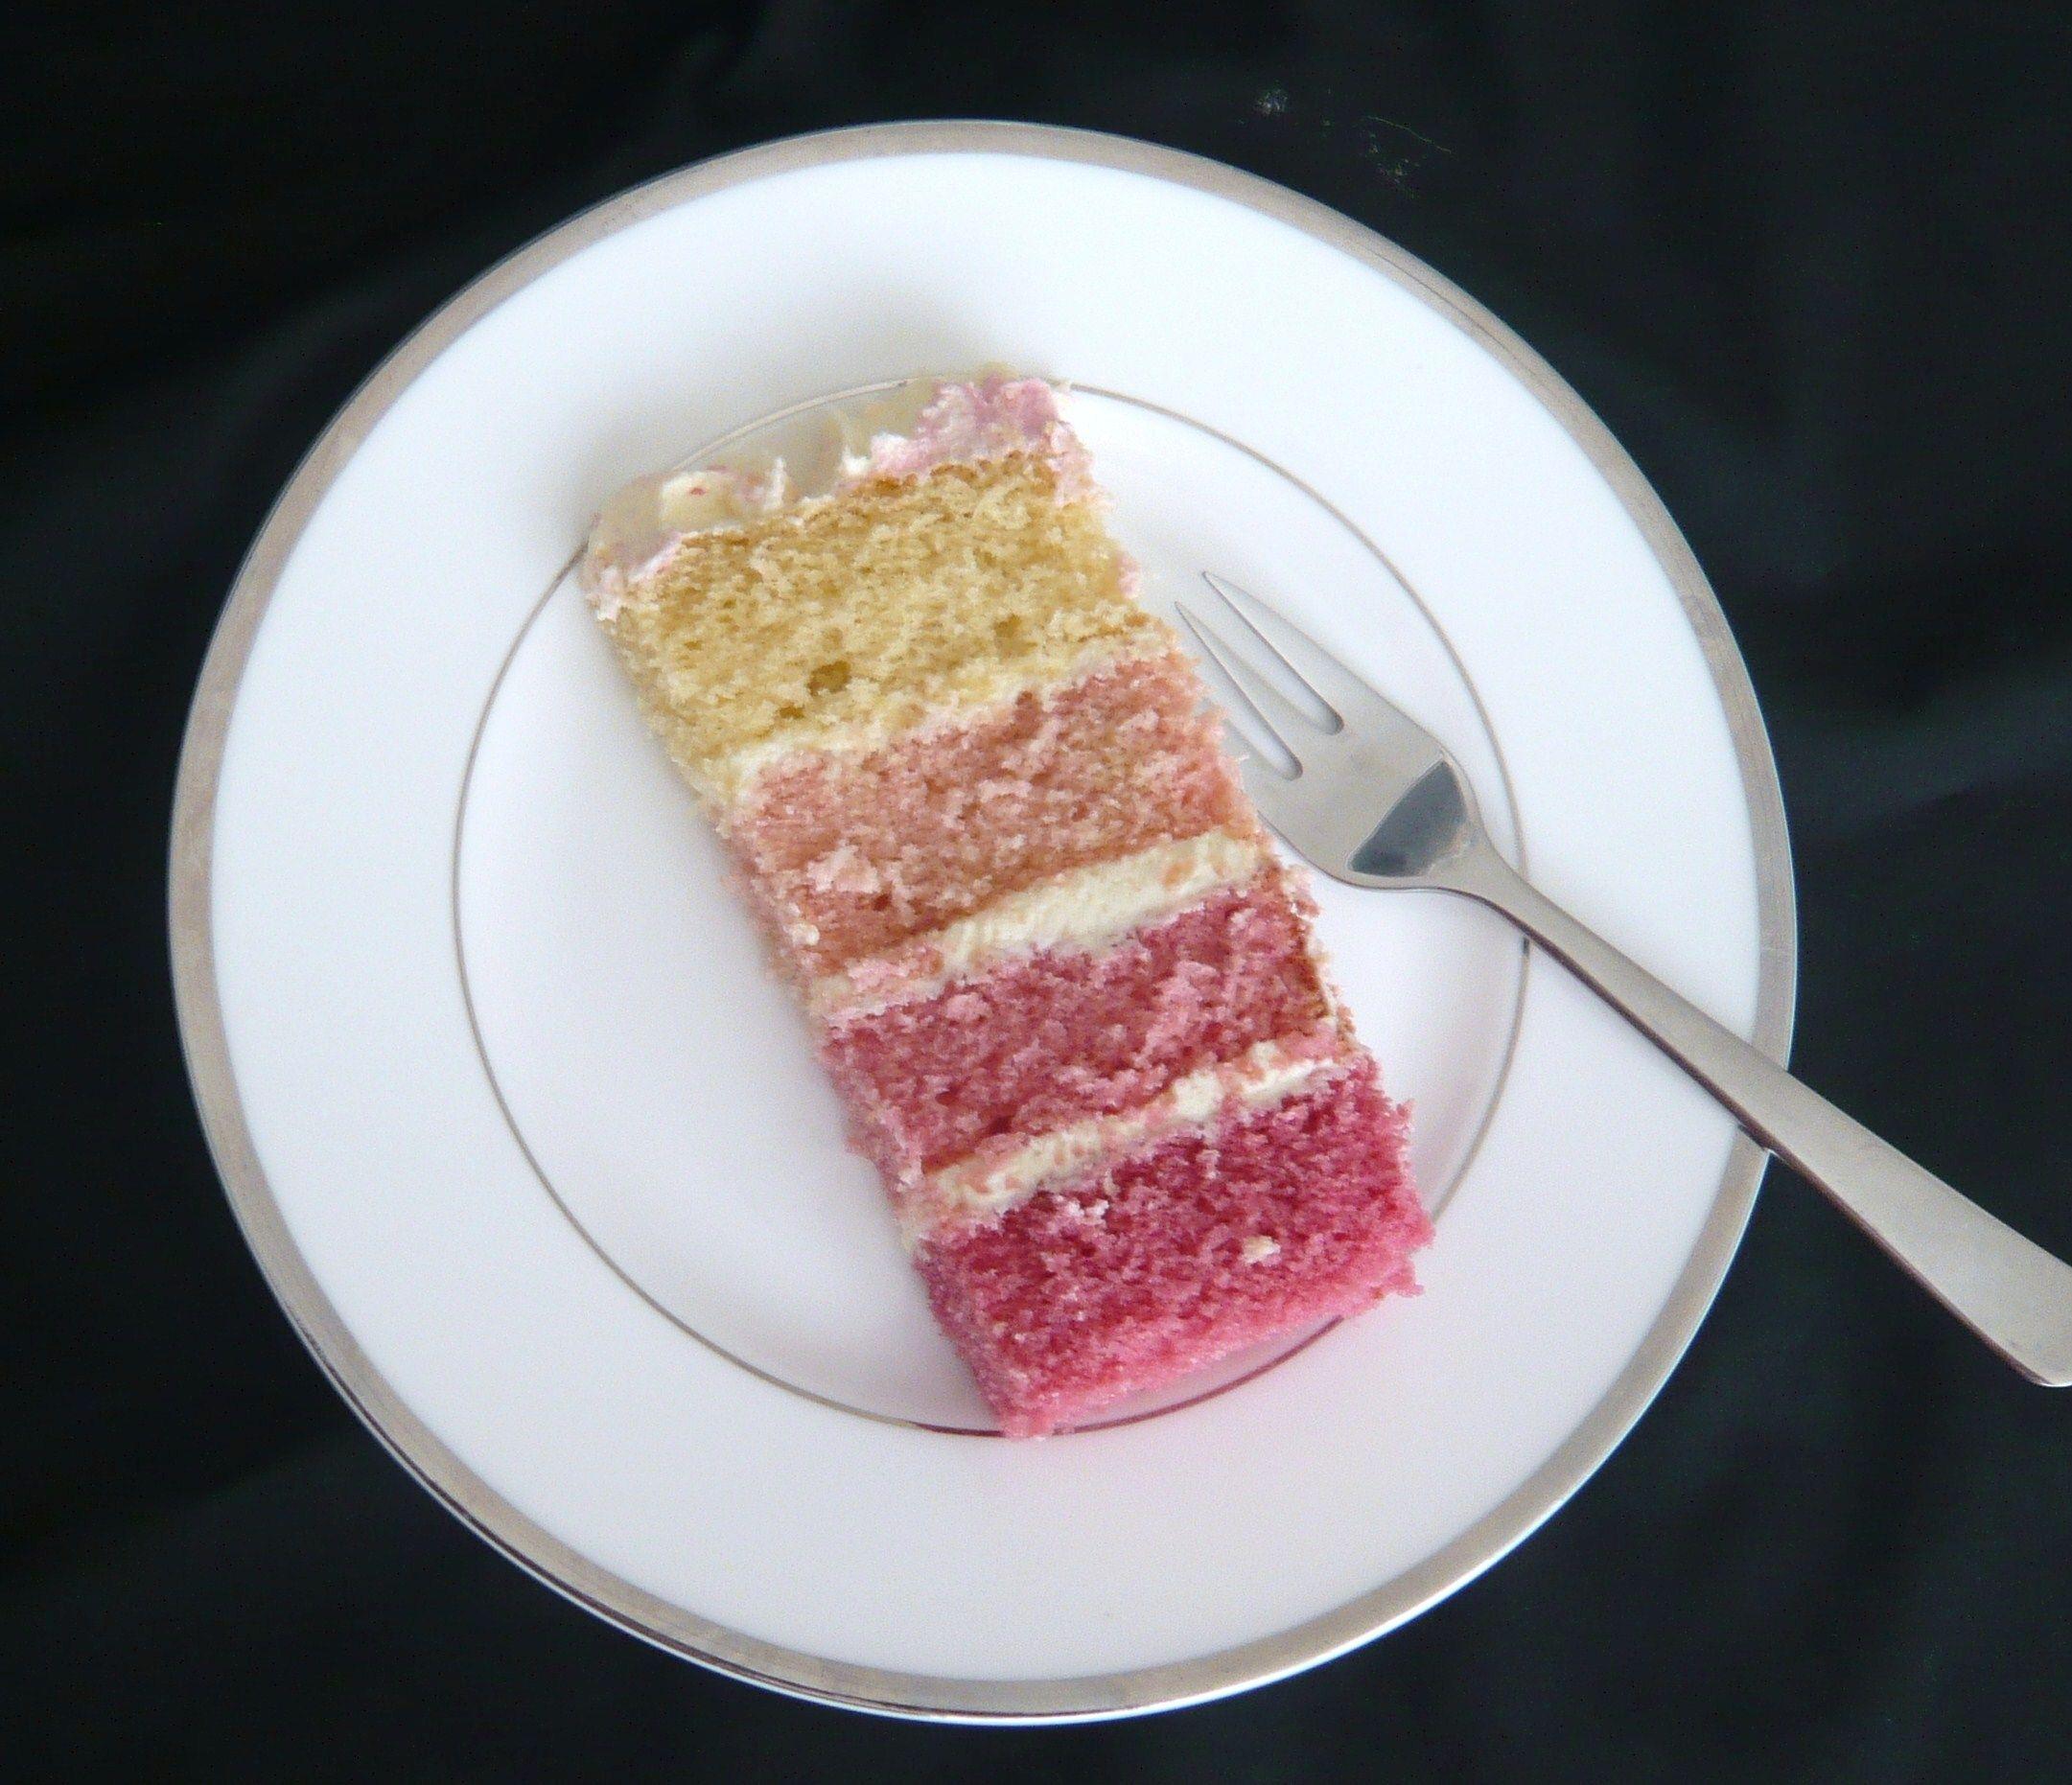 pink sponge cake recipe - Google Search | Pretty pink ...